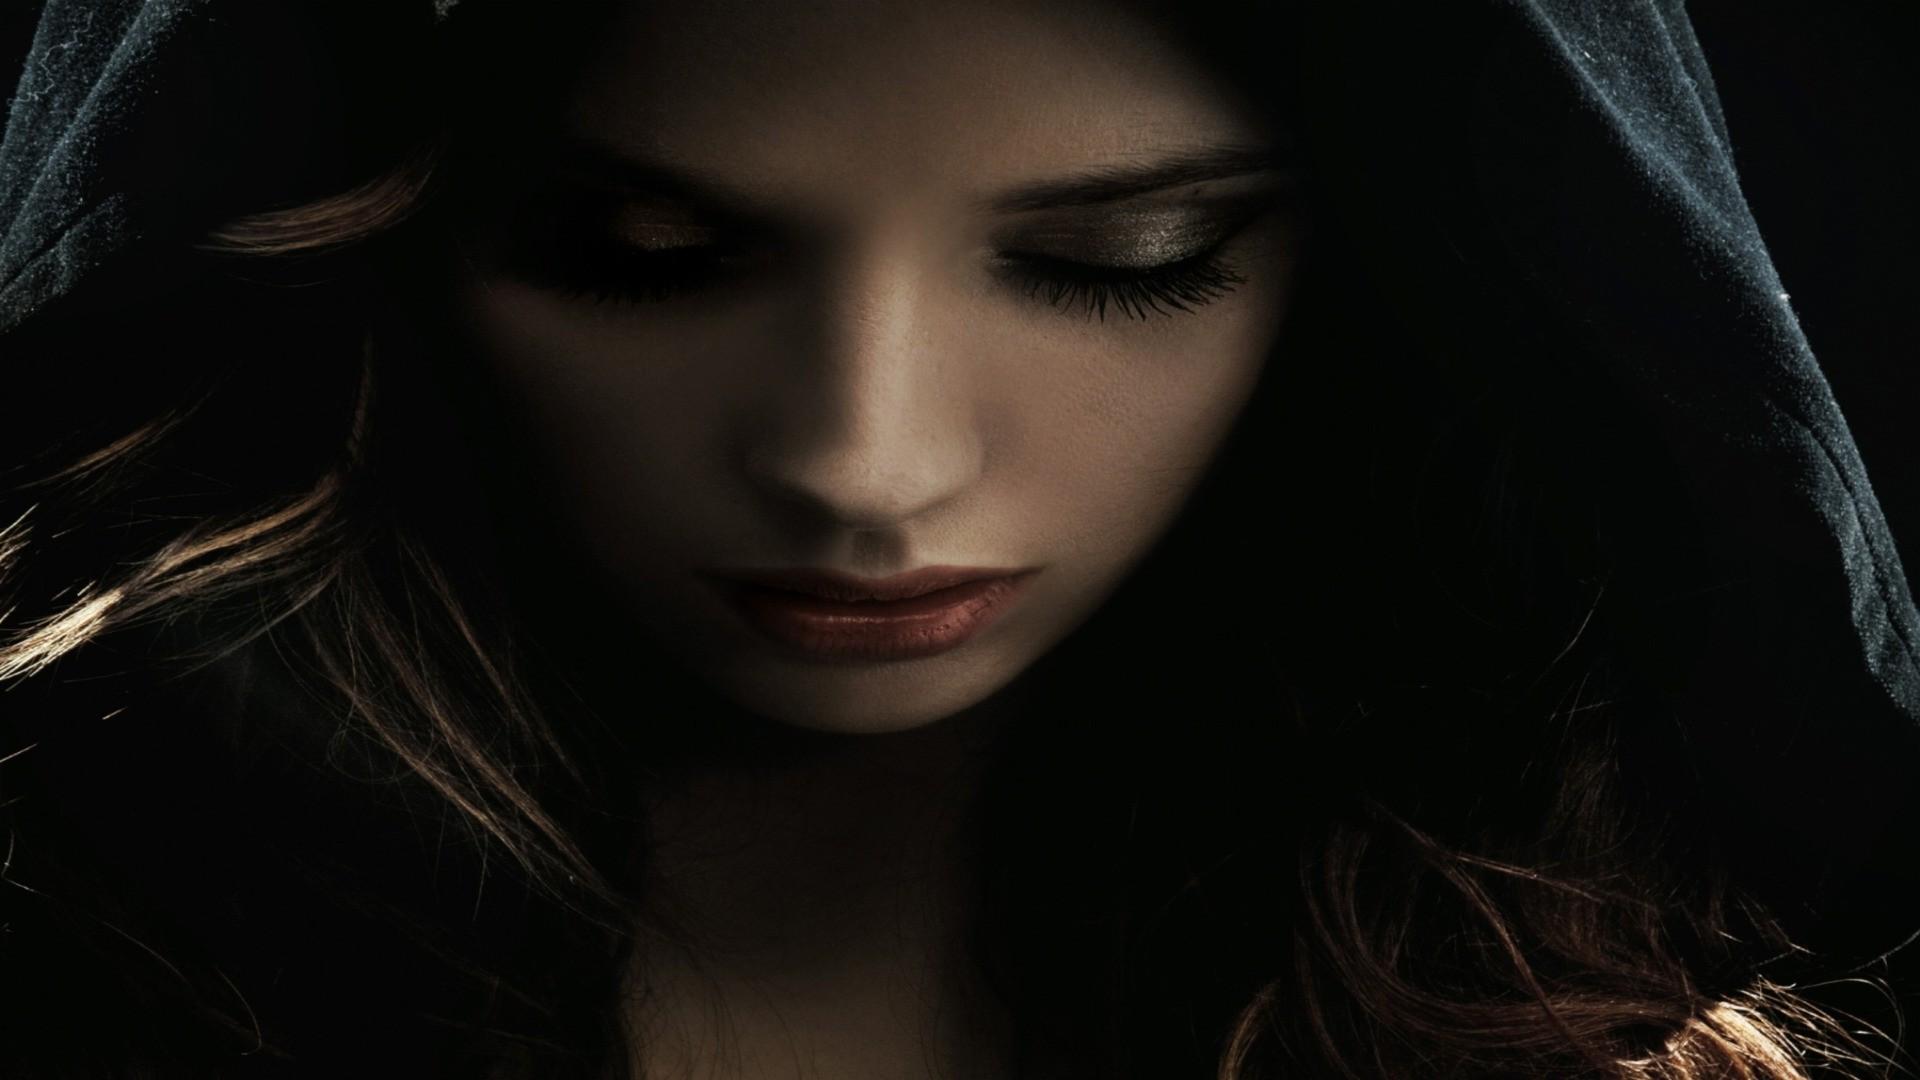 девушка капюшон взгляд лицо без смс